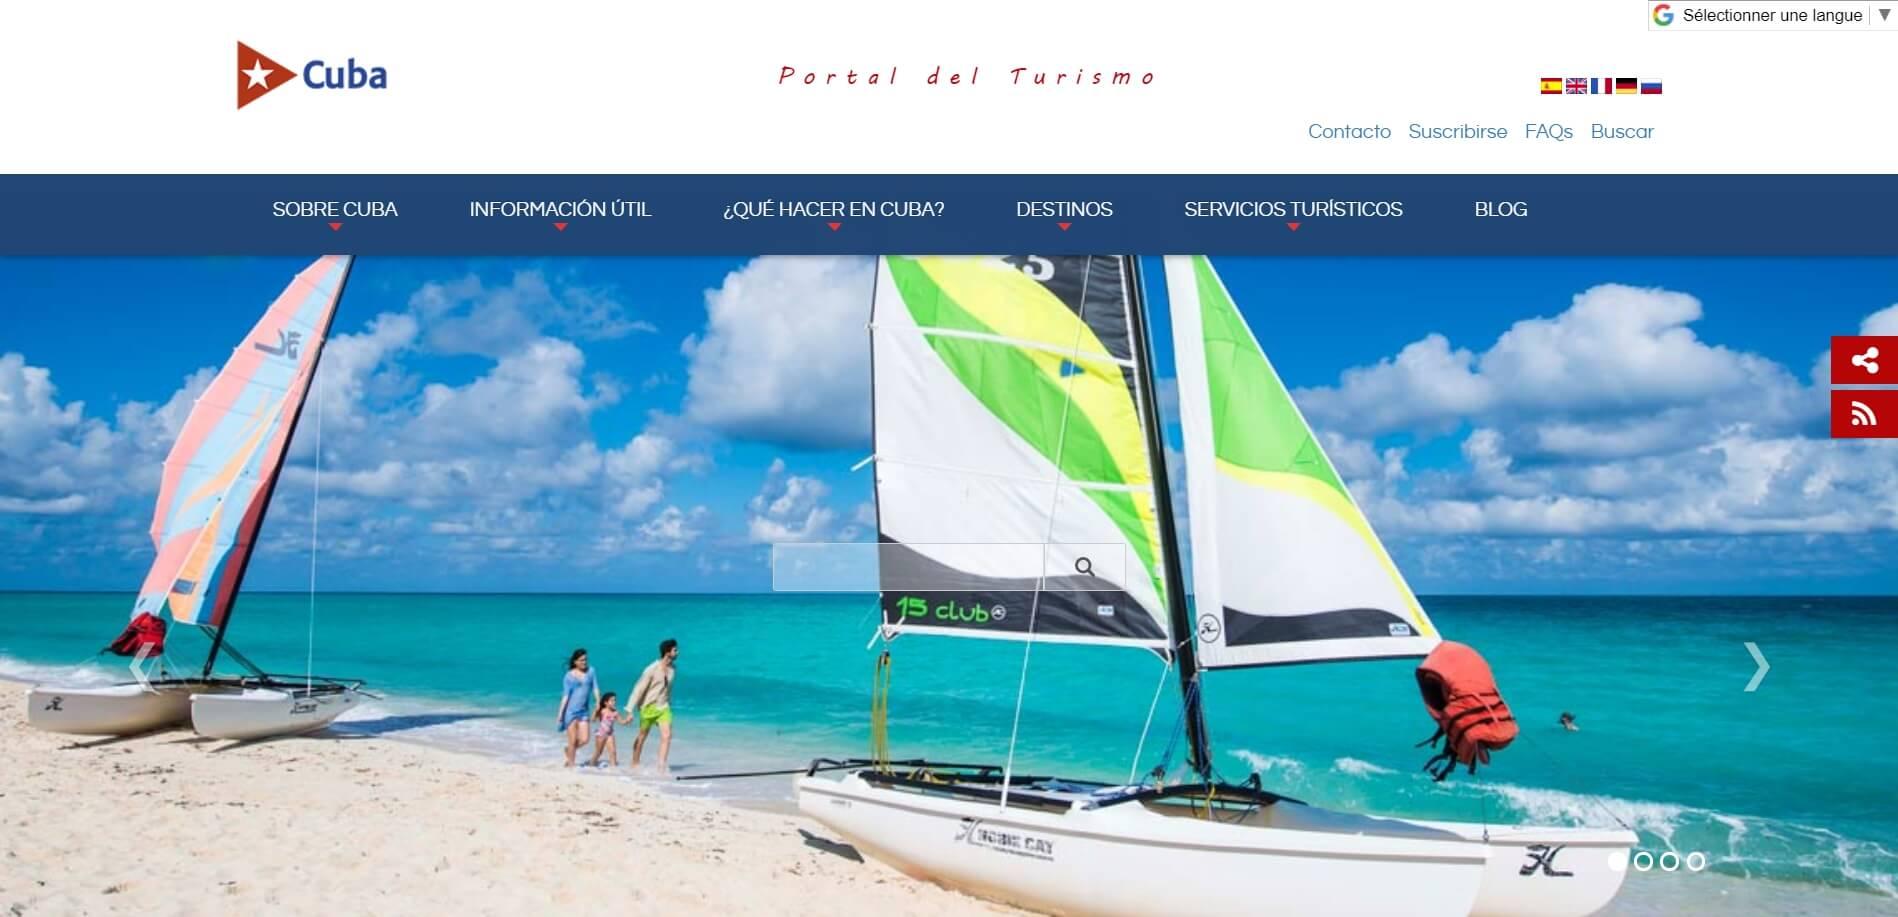 cuba travel site internet